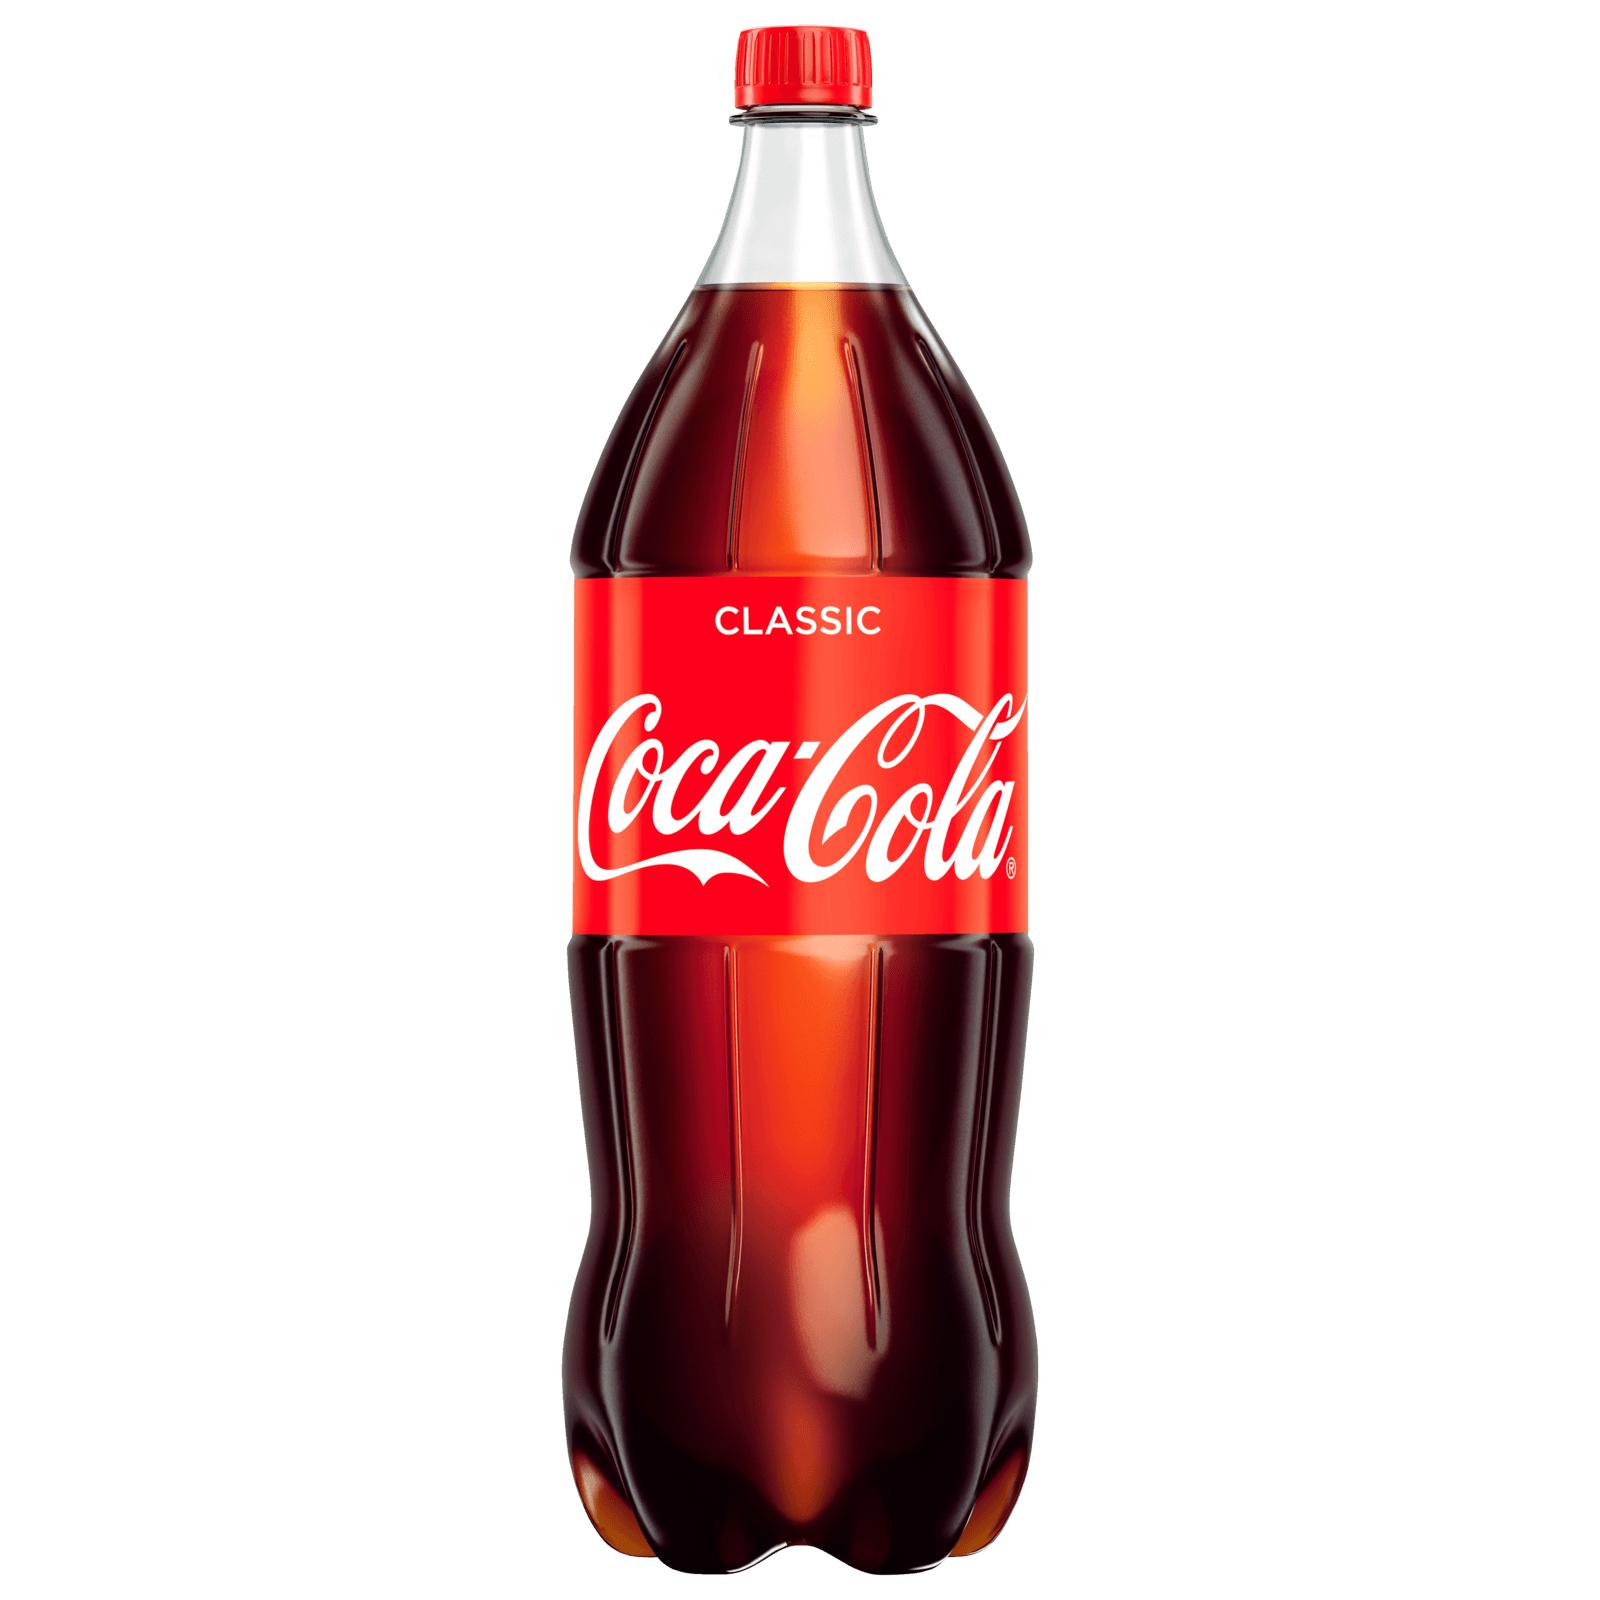 Netto Marken-Discount Coca Cola 2 Liter